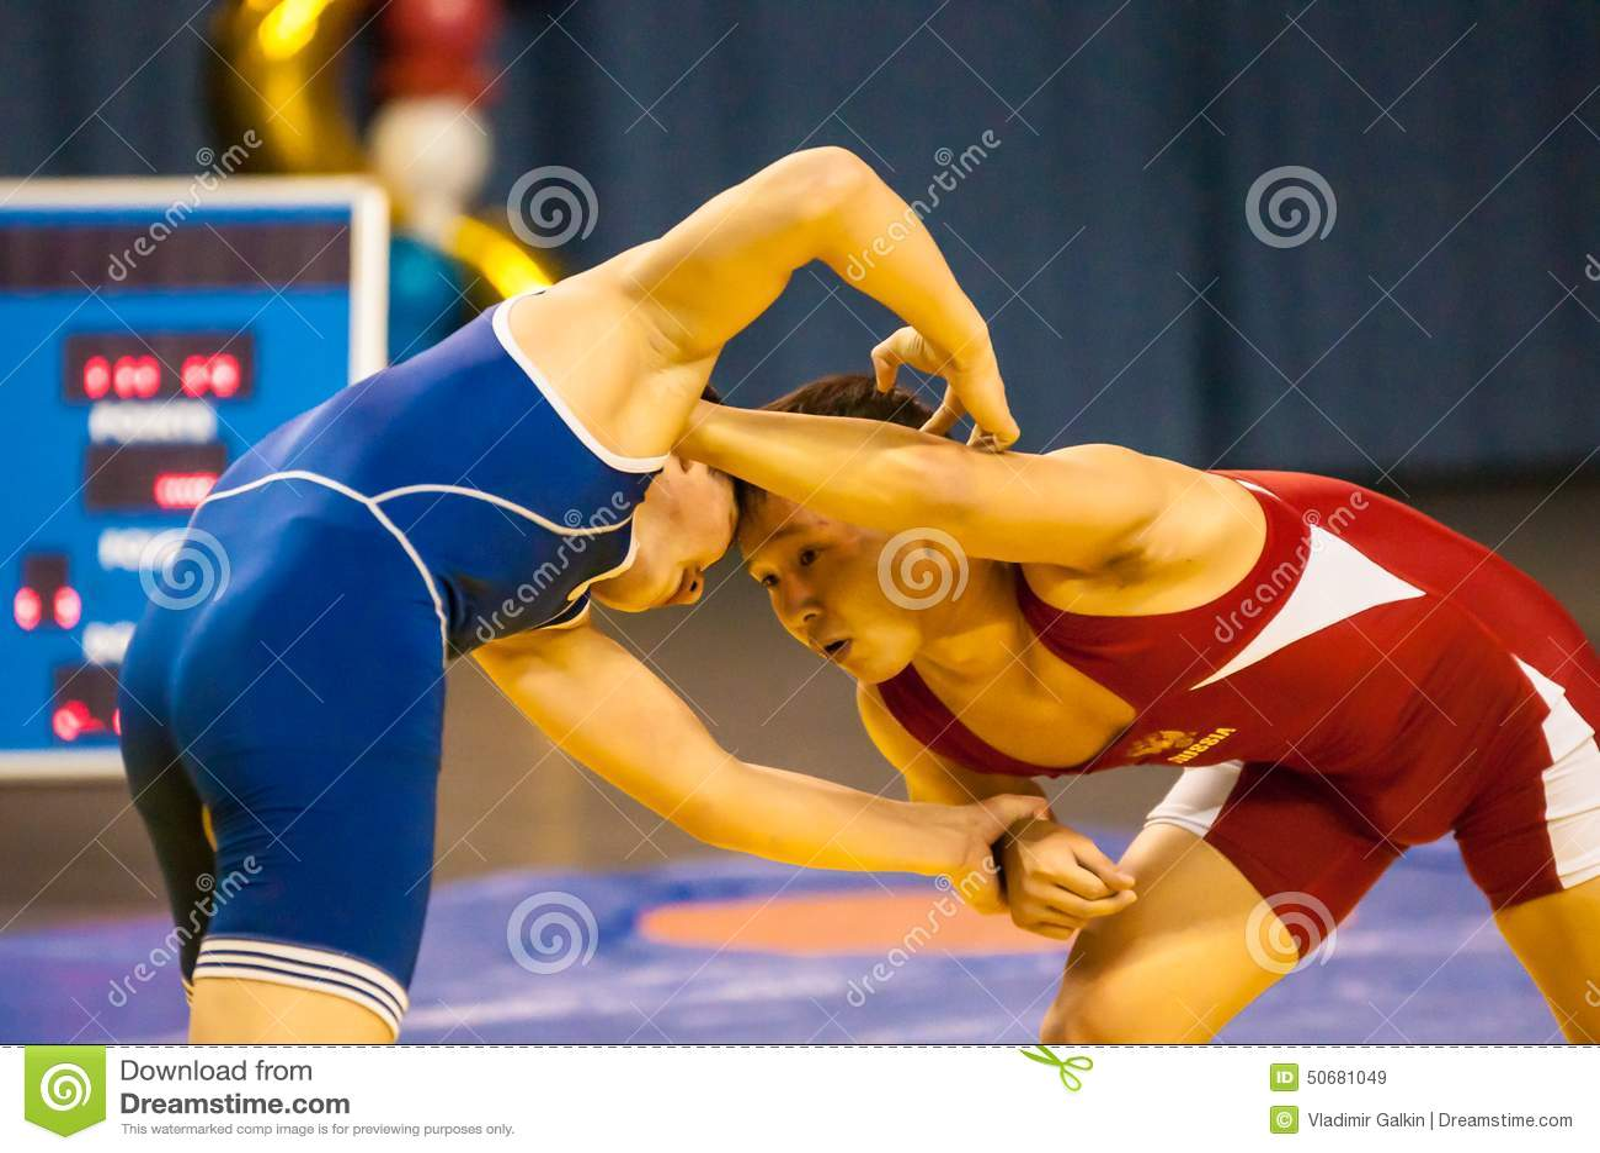 Download 两战斗机, 编辑类库存图片. 图片 包括有 体育运动, 培训, 有效地, 自由, 席子, 搏斗, 比赛, 投掷 - 50681049